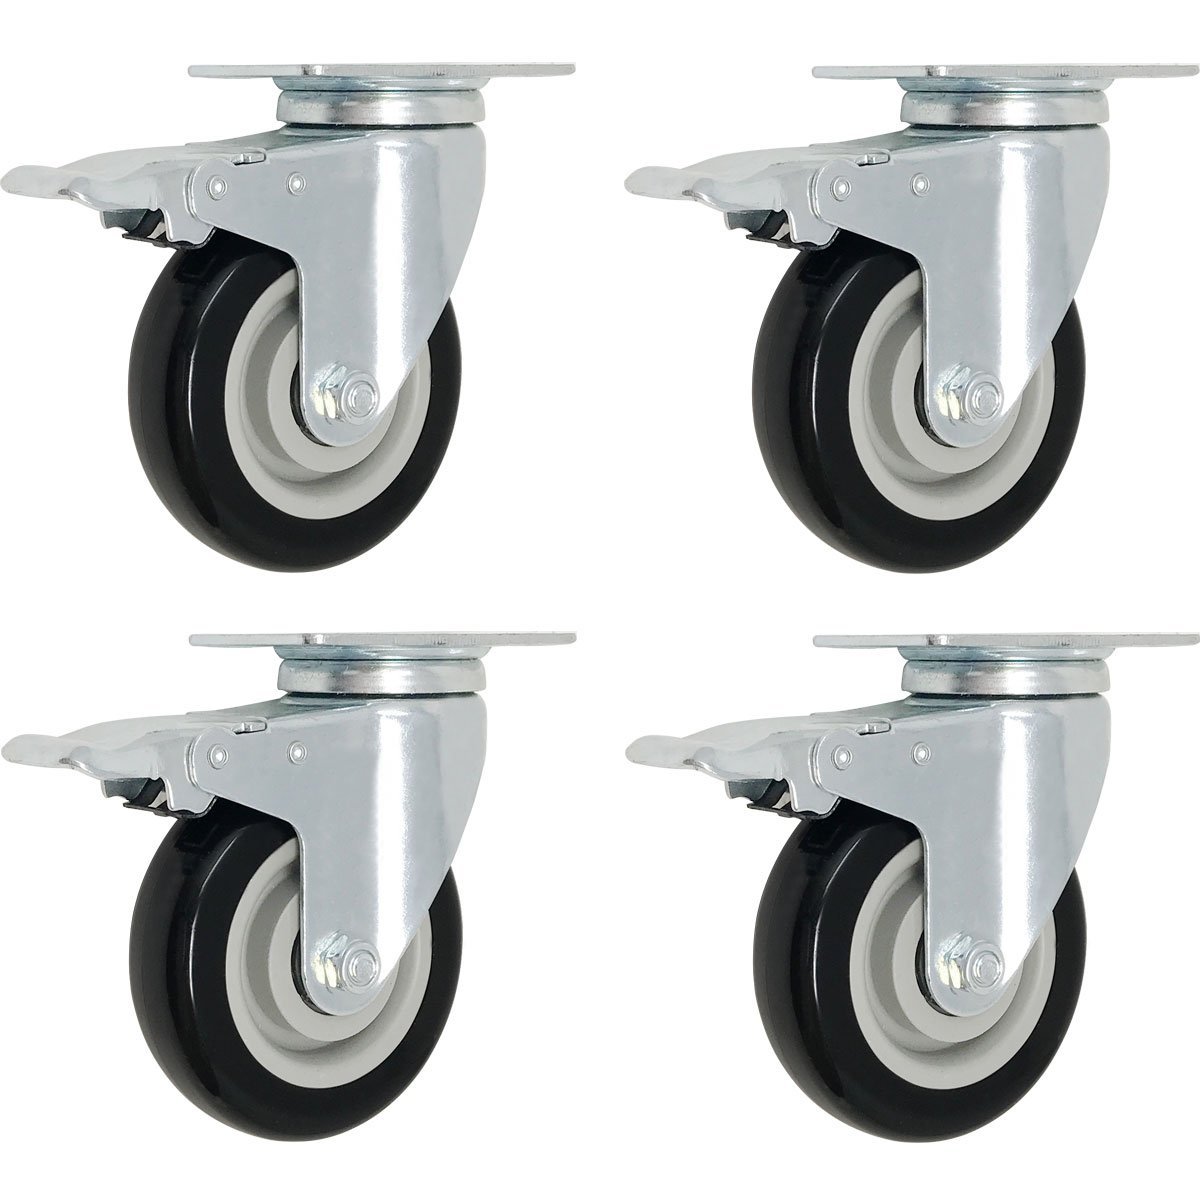 Online Best Service 4 Pack Caster Wheels Swivel Plate Brake Casters On Black Polyurethane Wheels (3 inch with Brake)